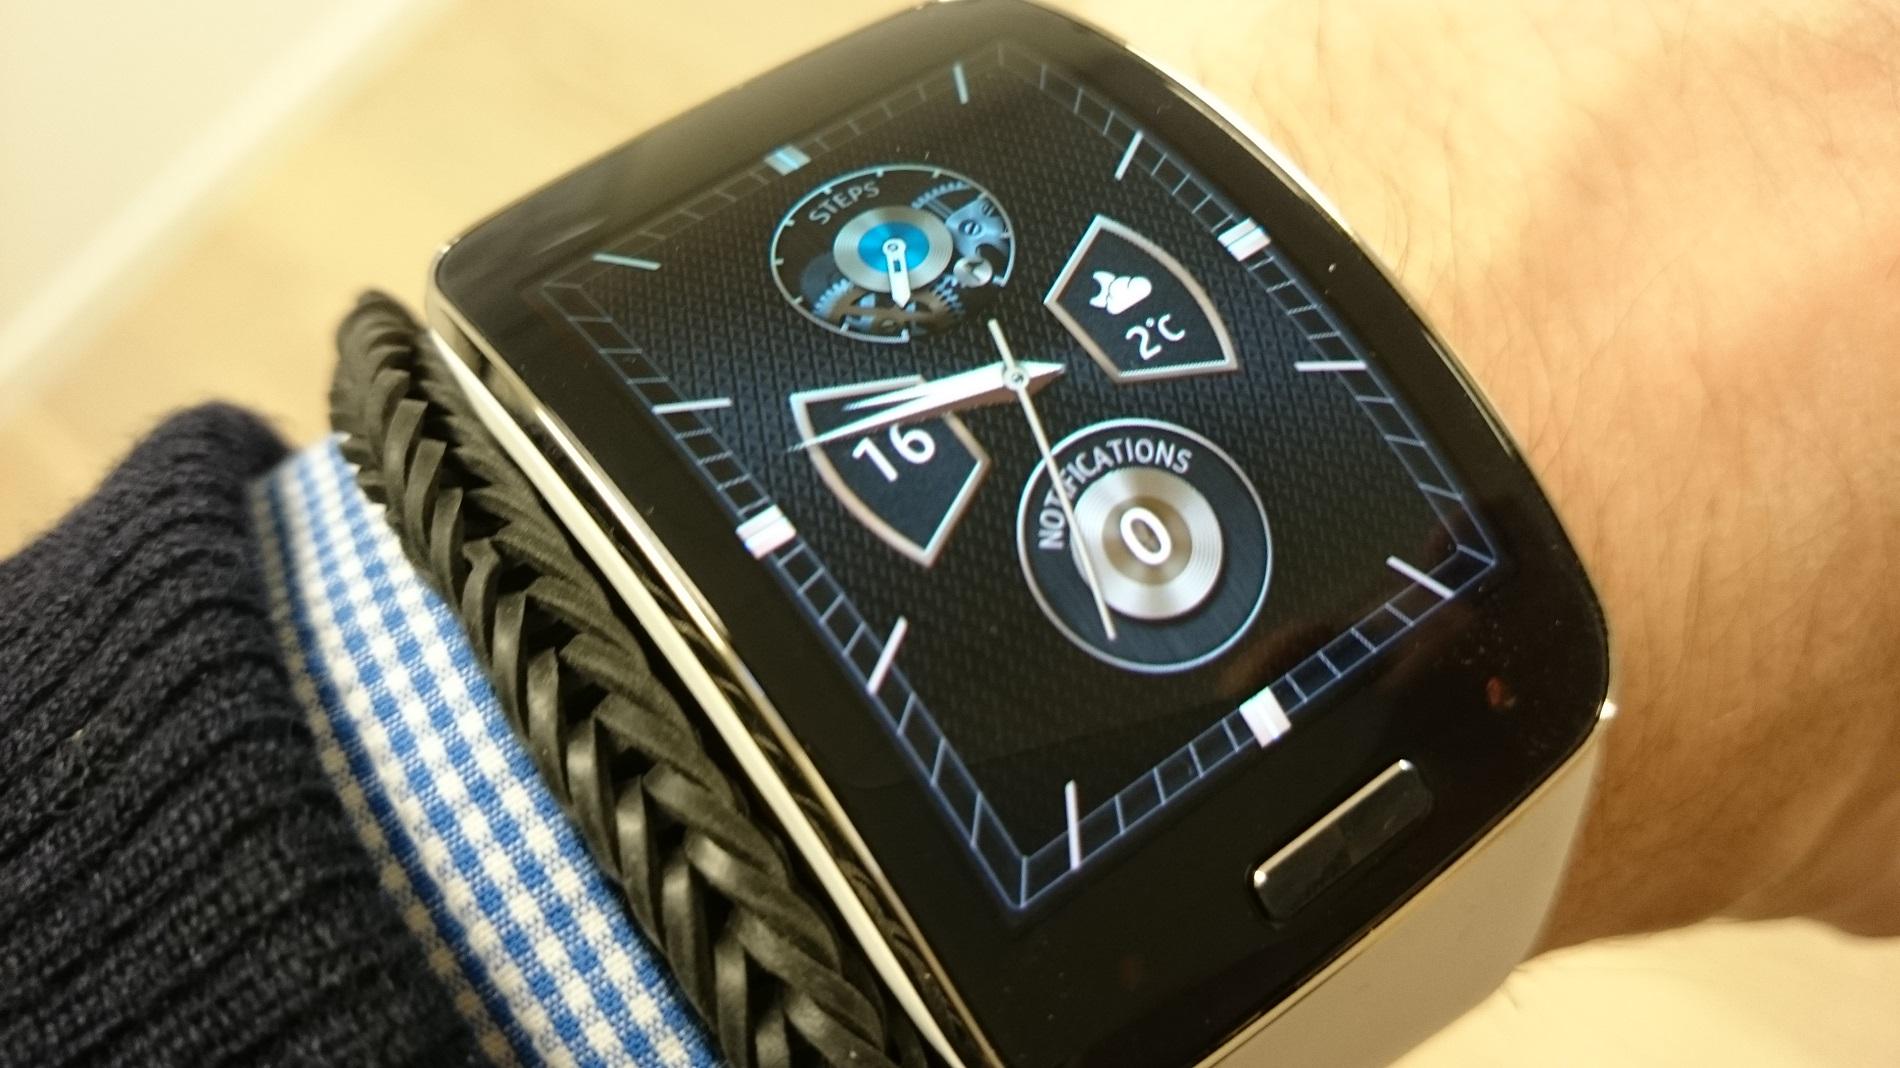 Billedgalleri af Samsung Gear S